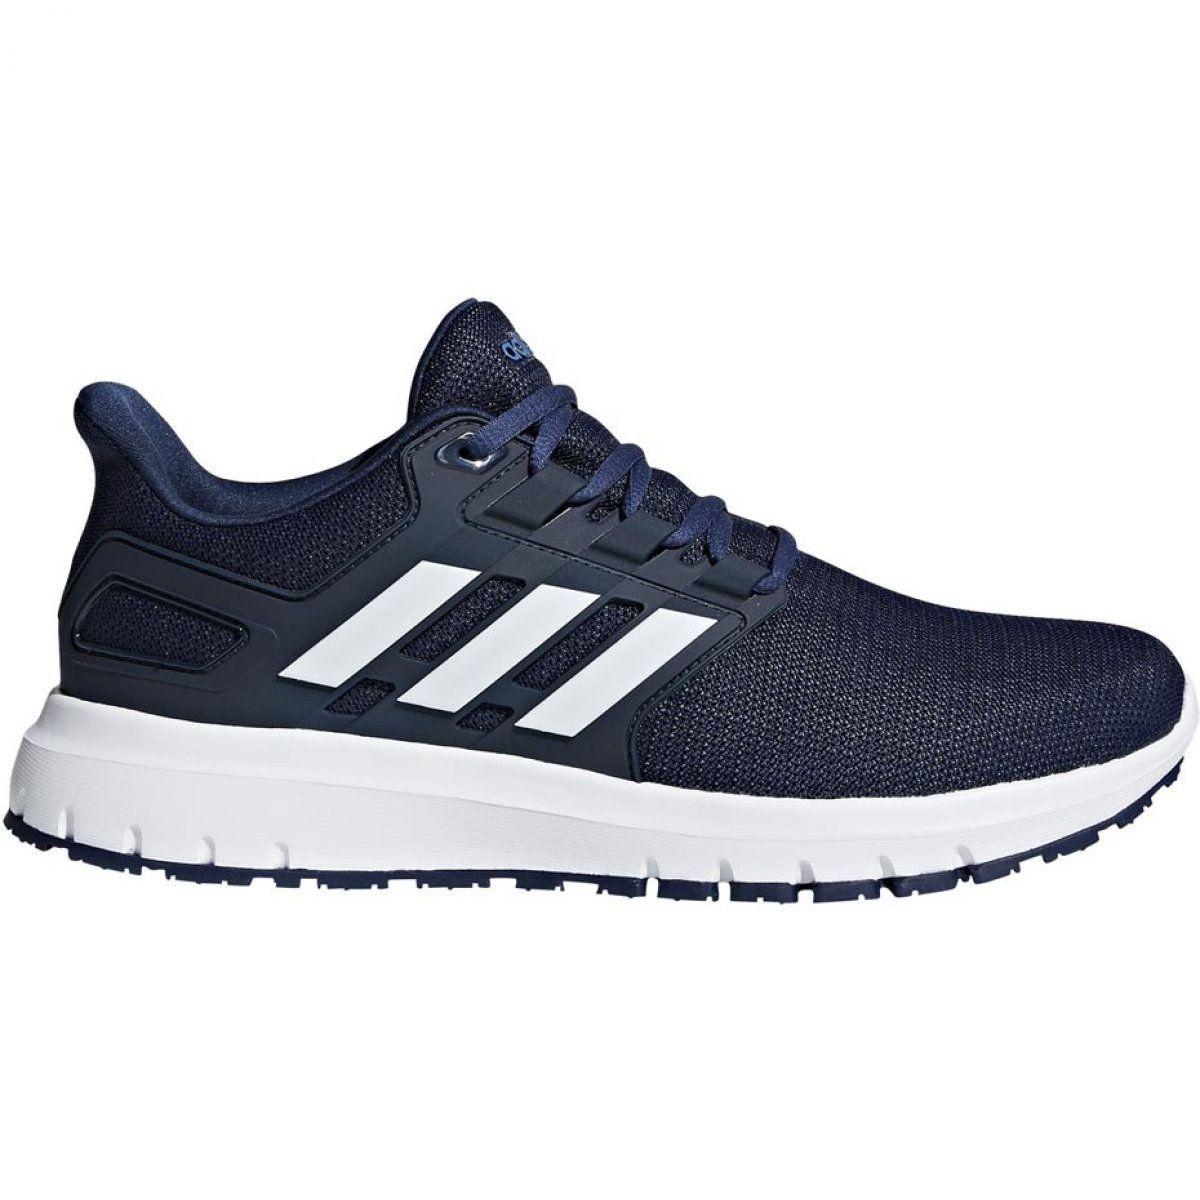 Buty Biegowe Adidas Energy Cloud 2 M Cp9769 Granatowe Adidas Shoes Adidas Sneakers Adidas Running Shoes